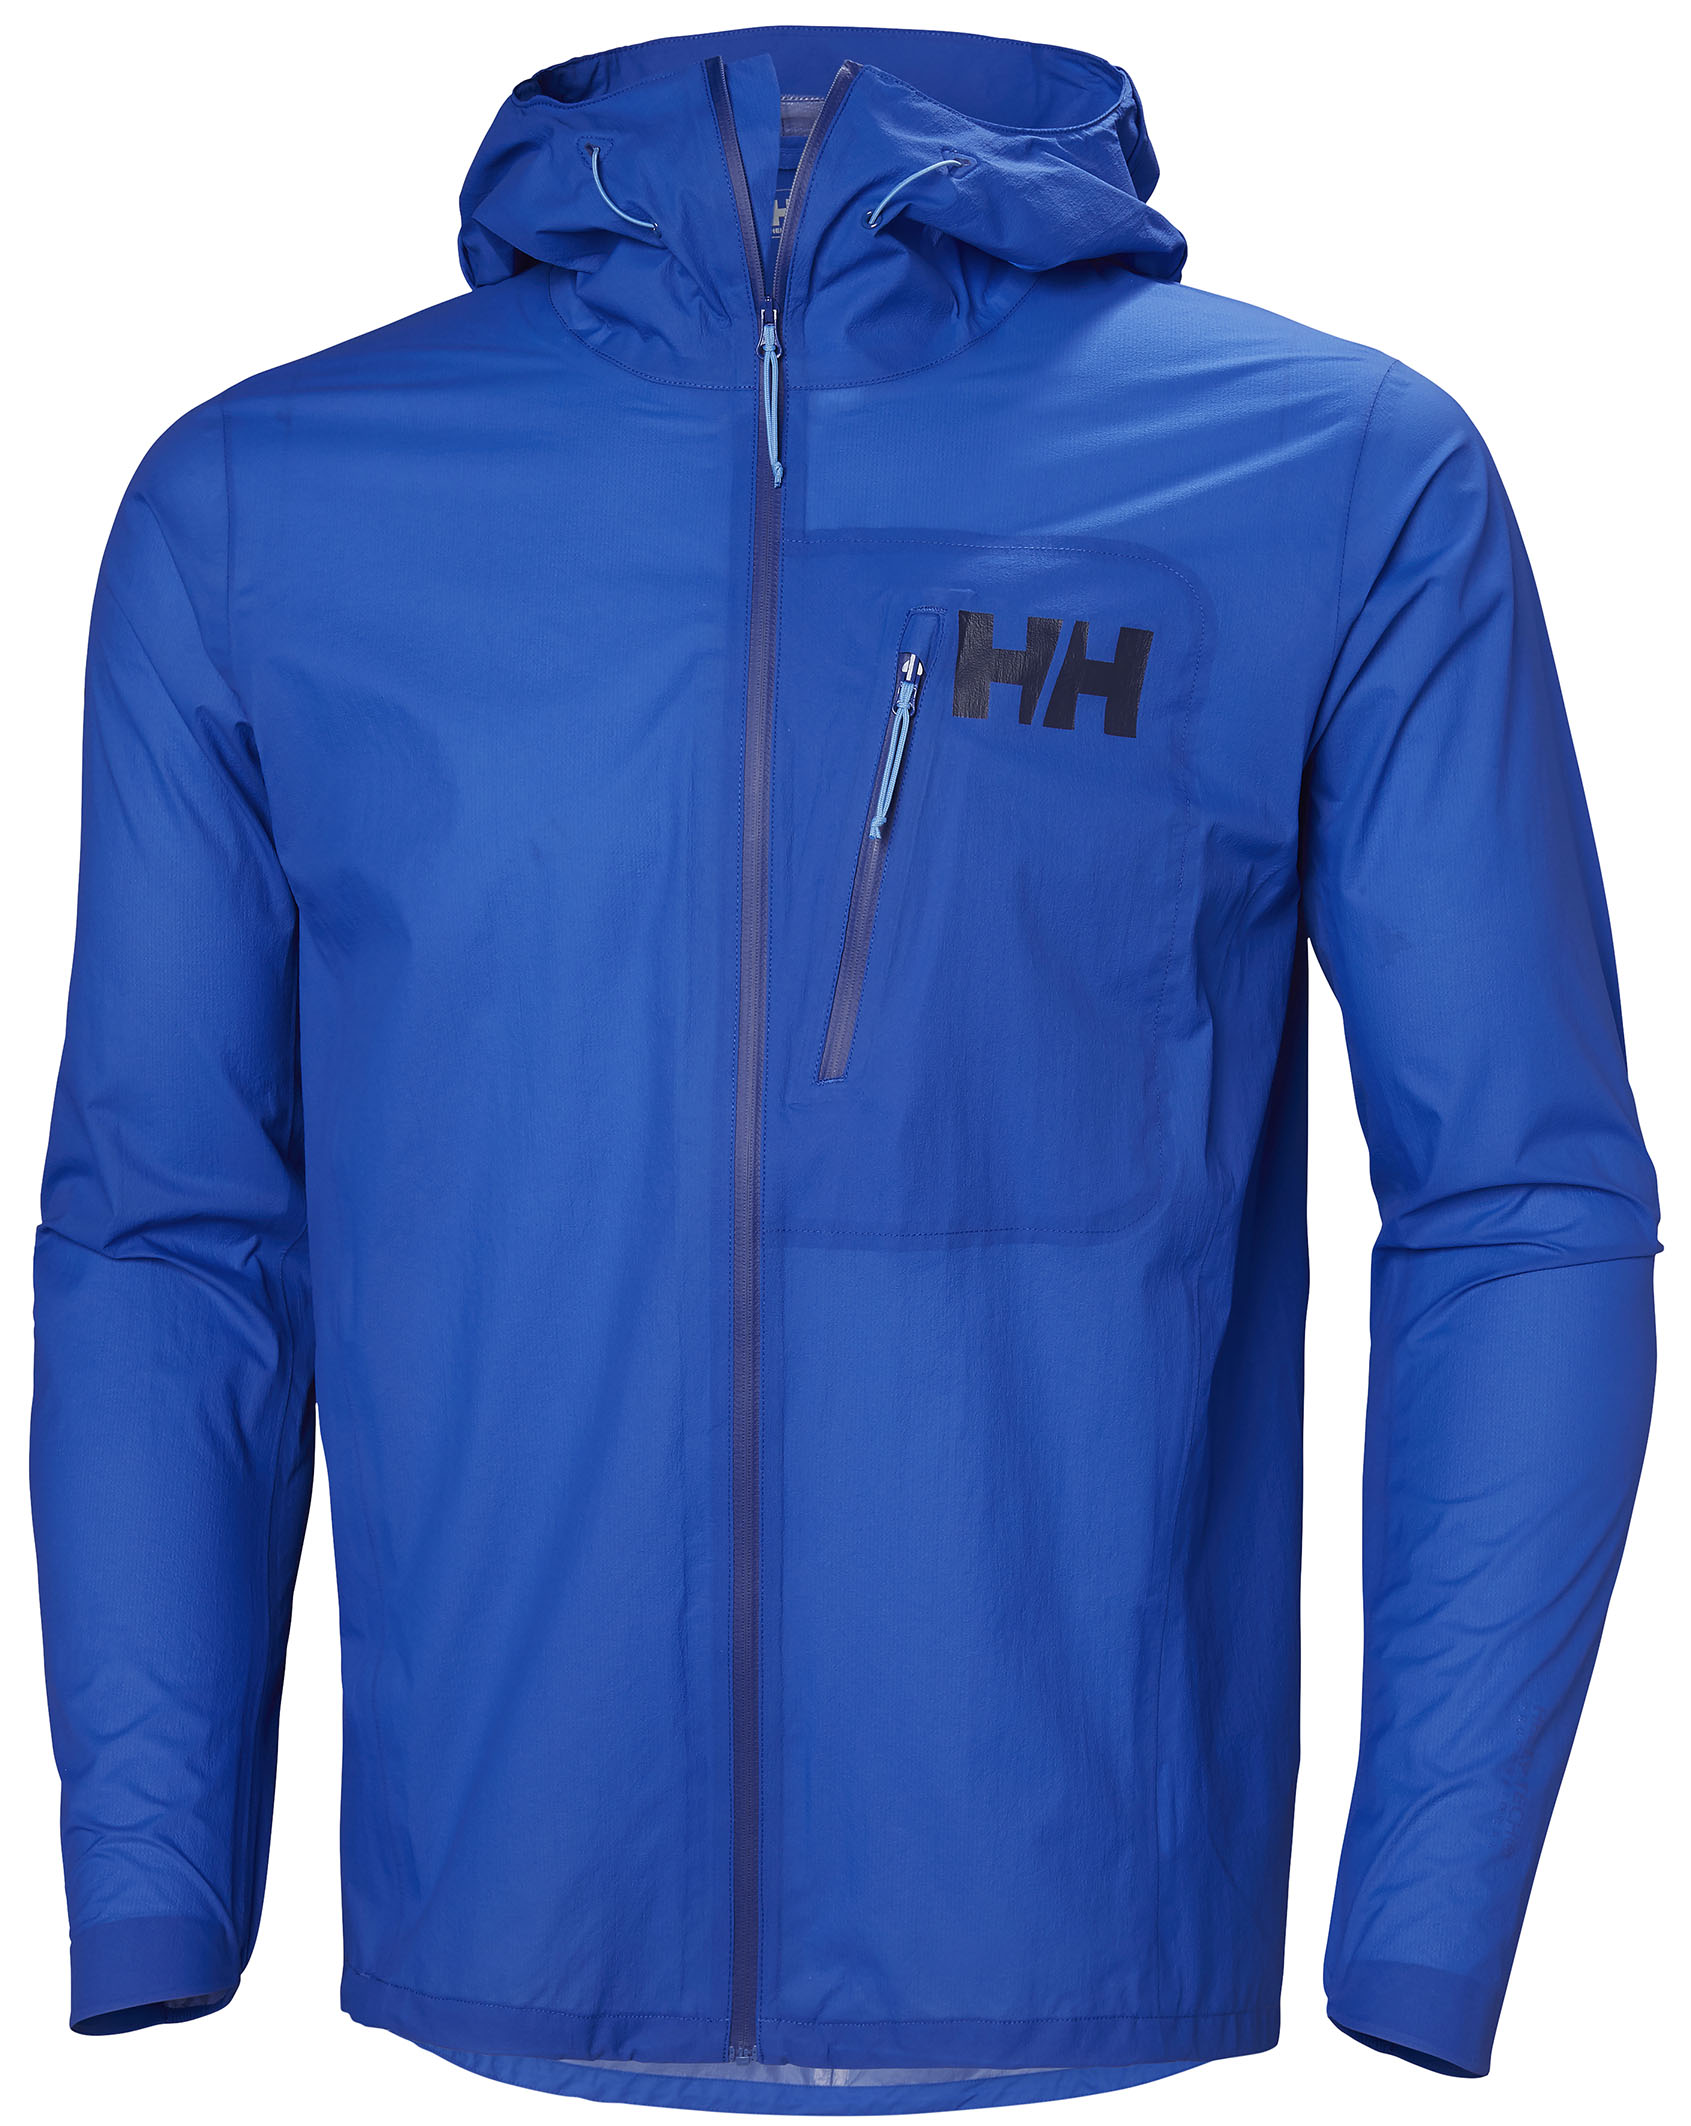 Minimalist Jacket de Helly Hansen